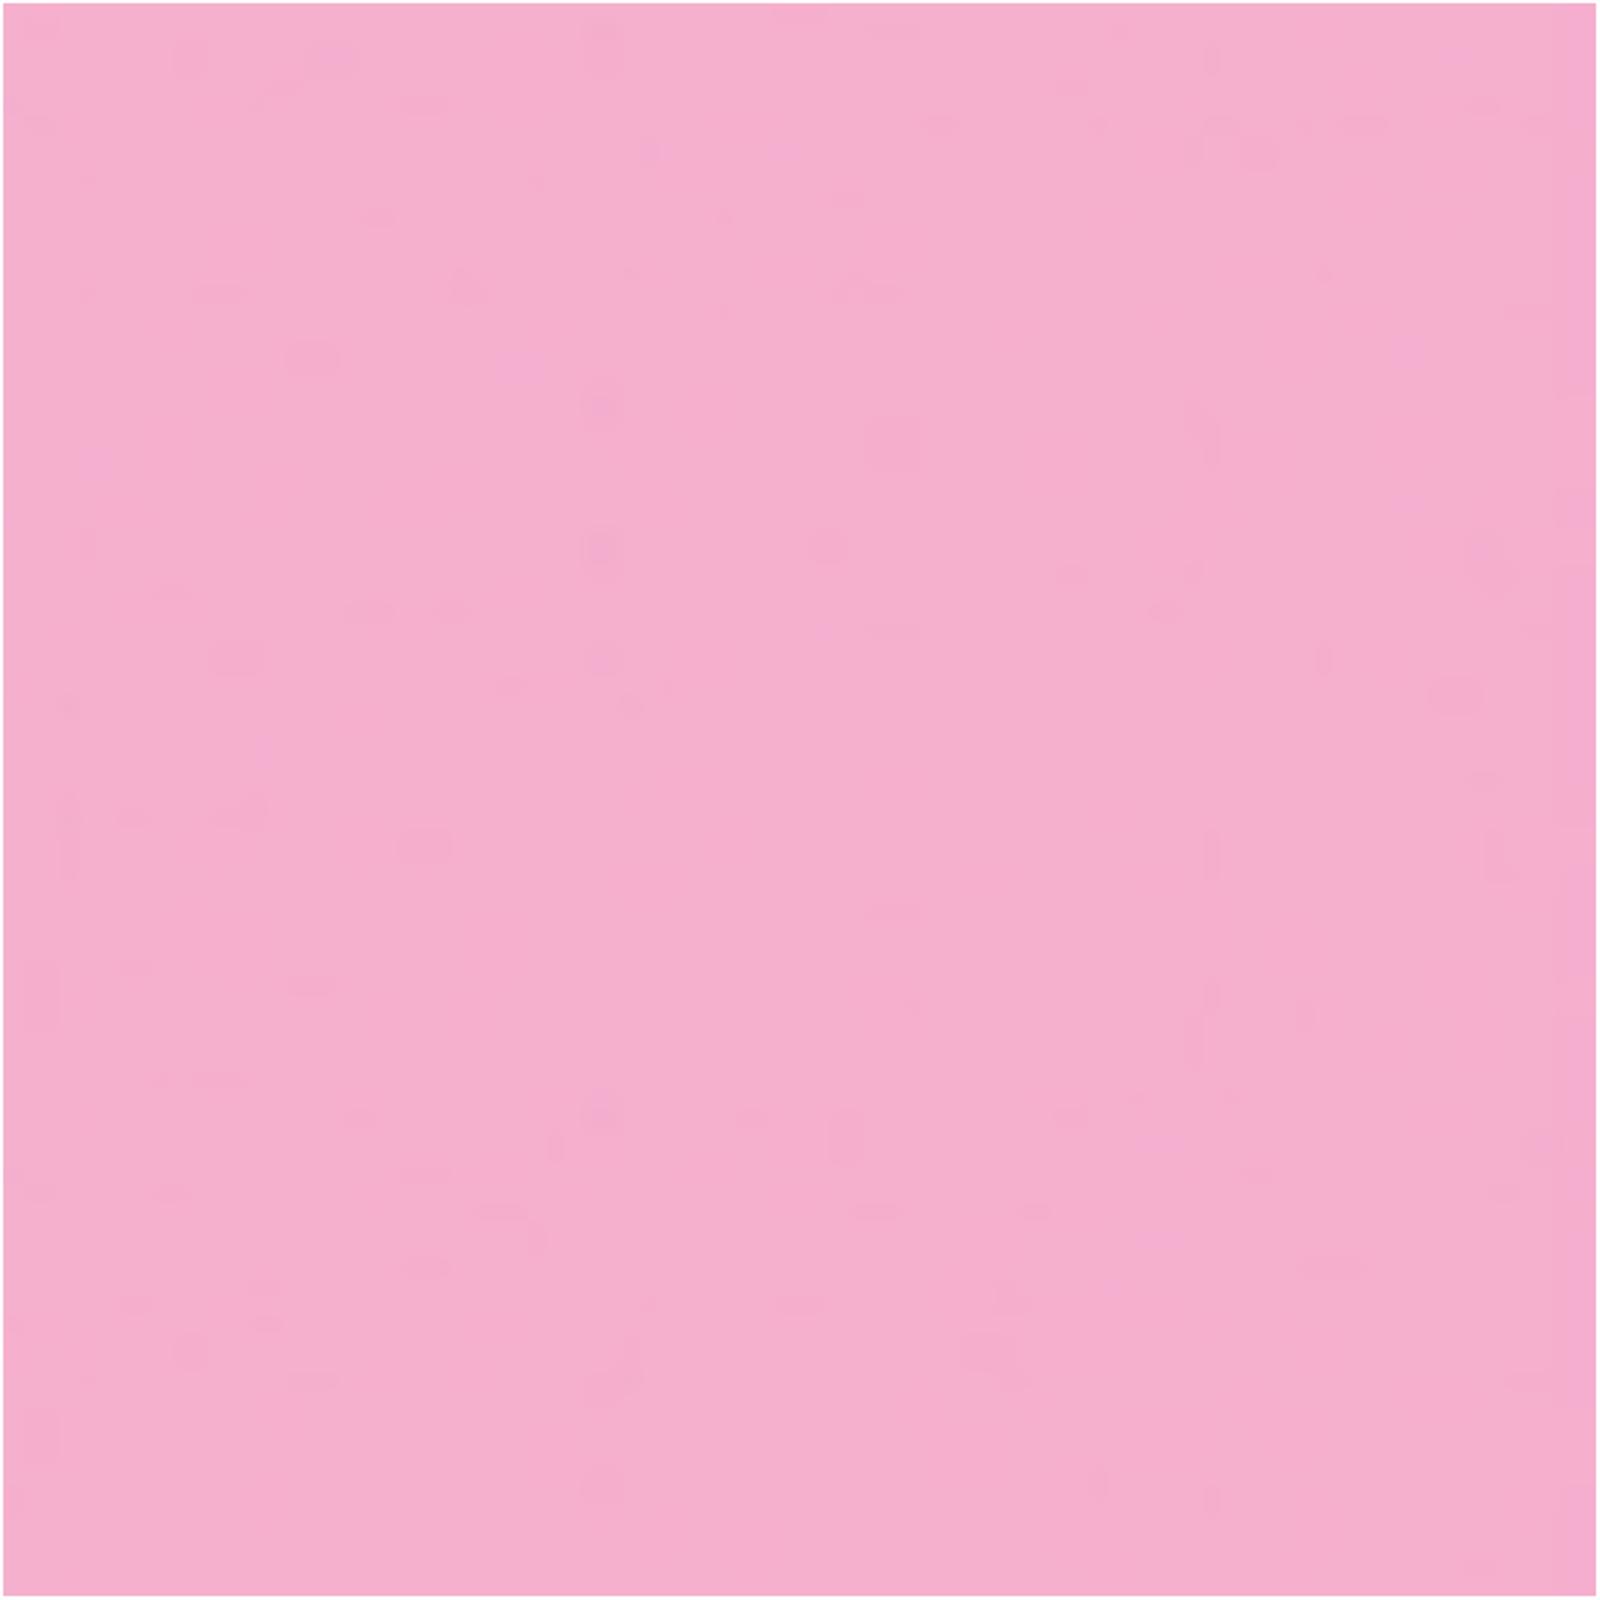 decor soft roz baby